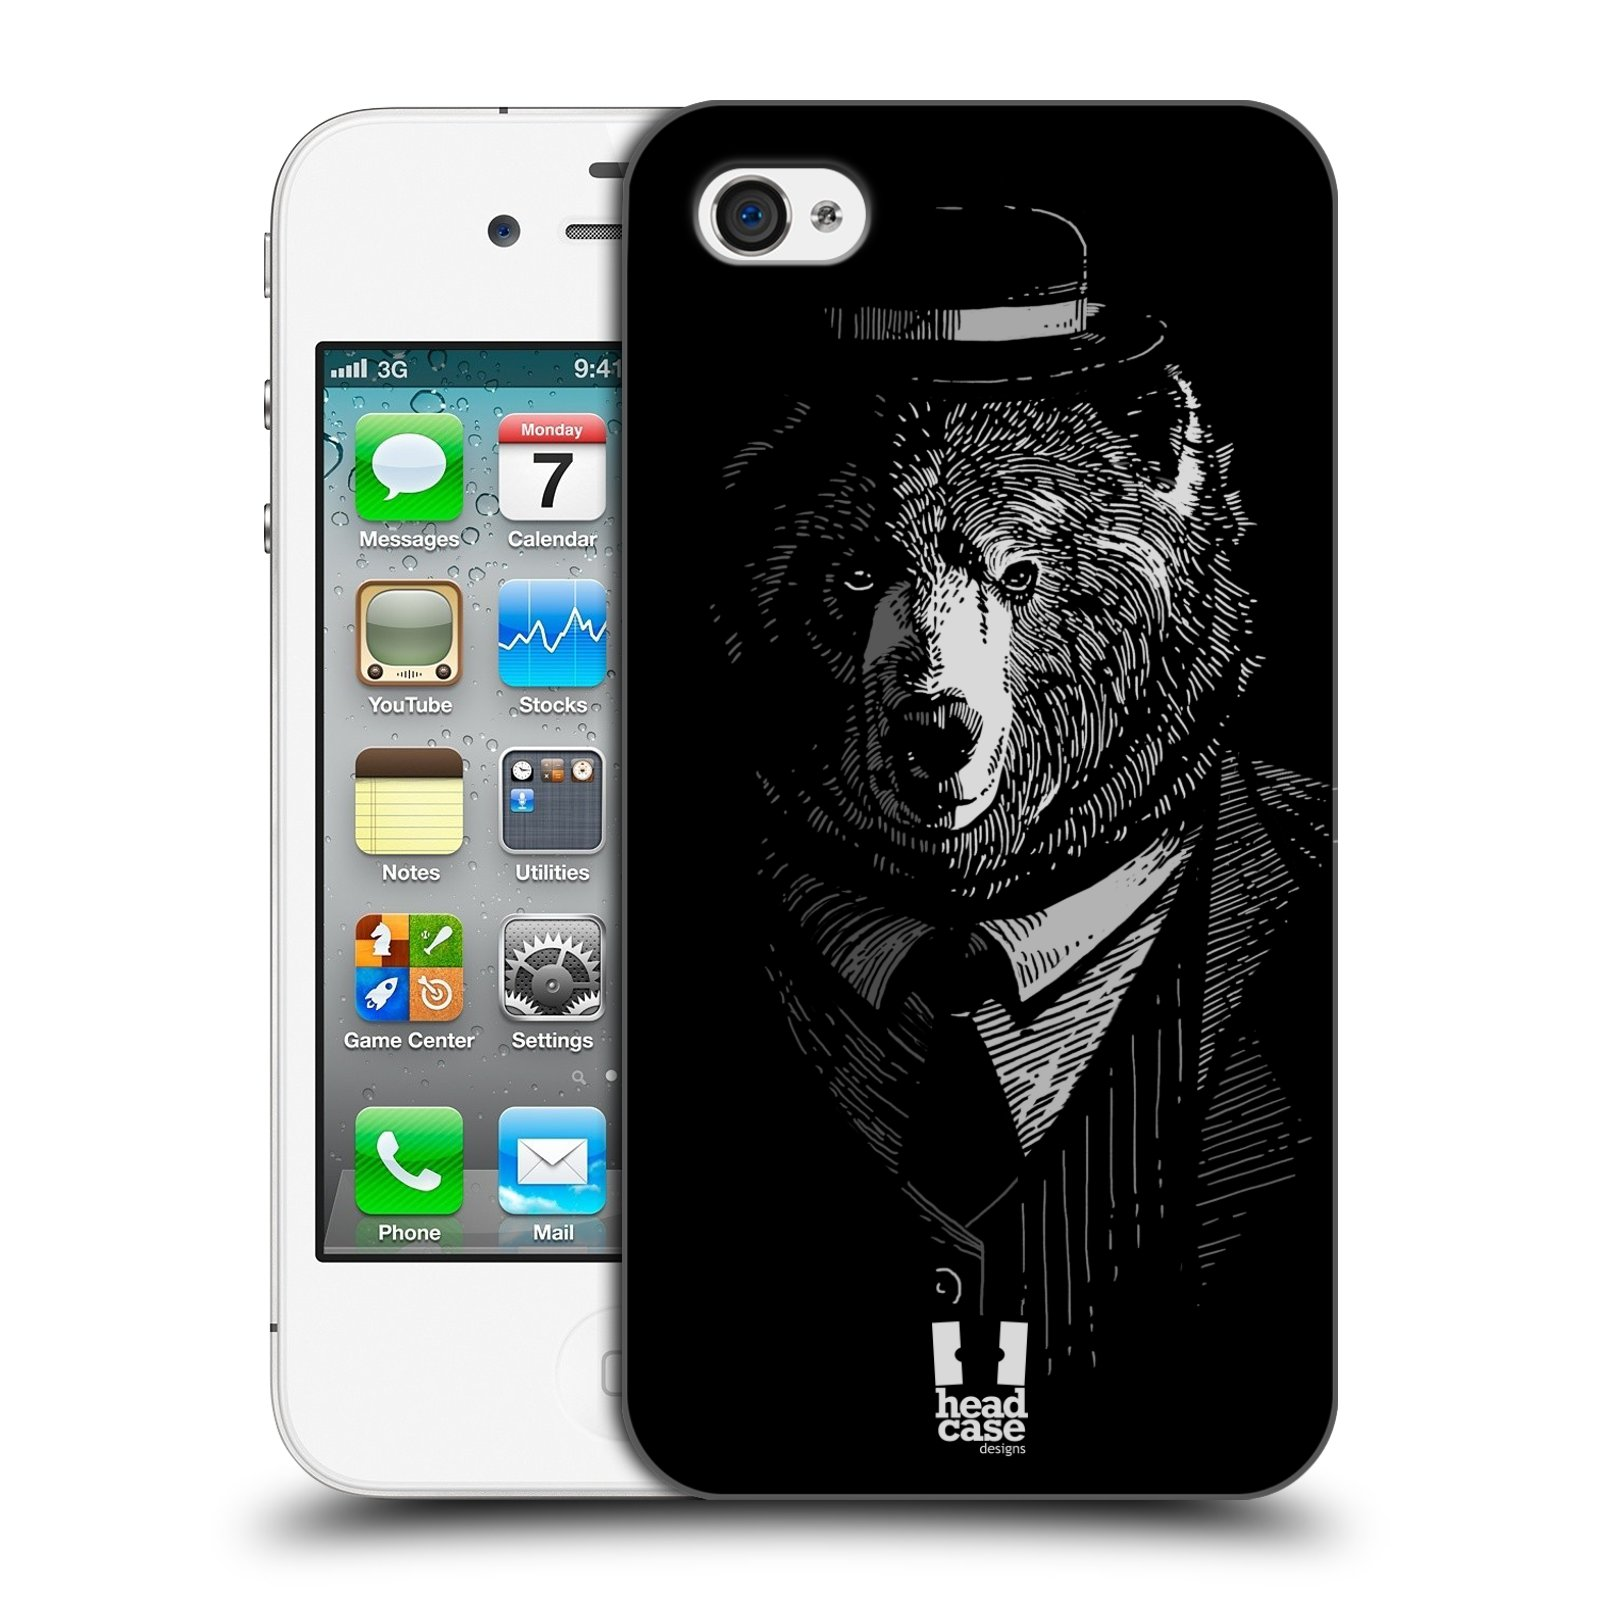 HEAD CASE plastový obal na mobil Apple Iphone 4/4S vzor Zvíře v obleku medvěd